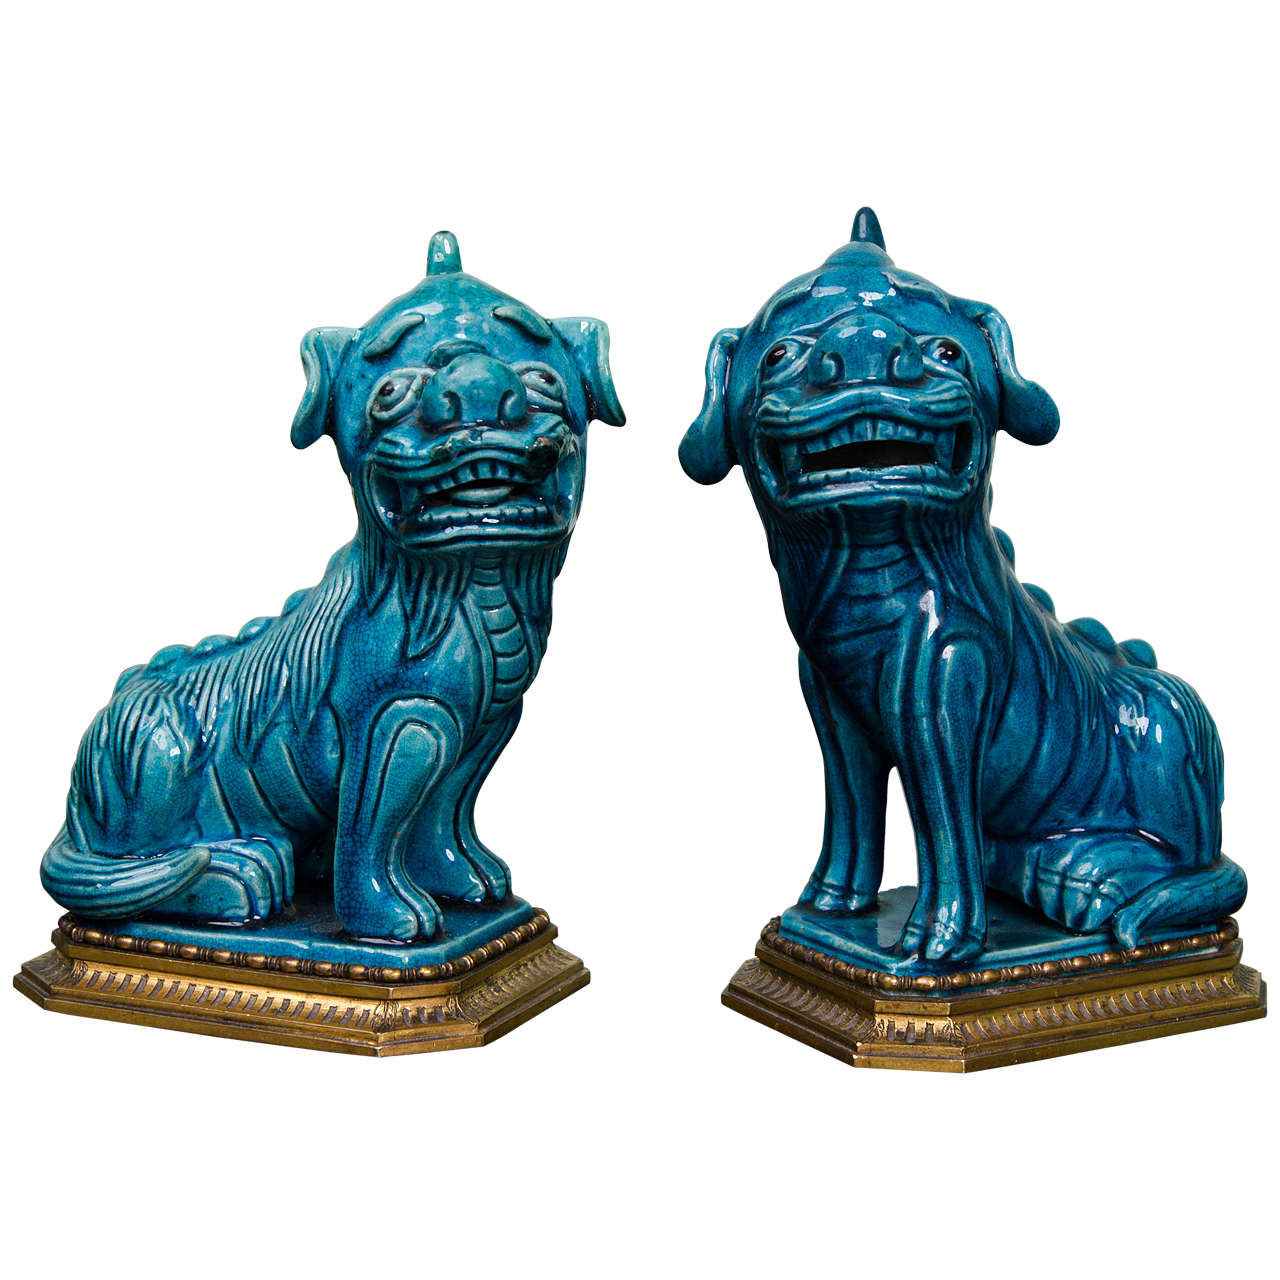 Pair of Chinese Turquoise Glazed Foo Dogs on Ormolu Mounts